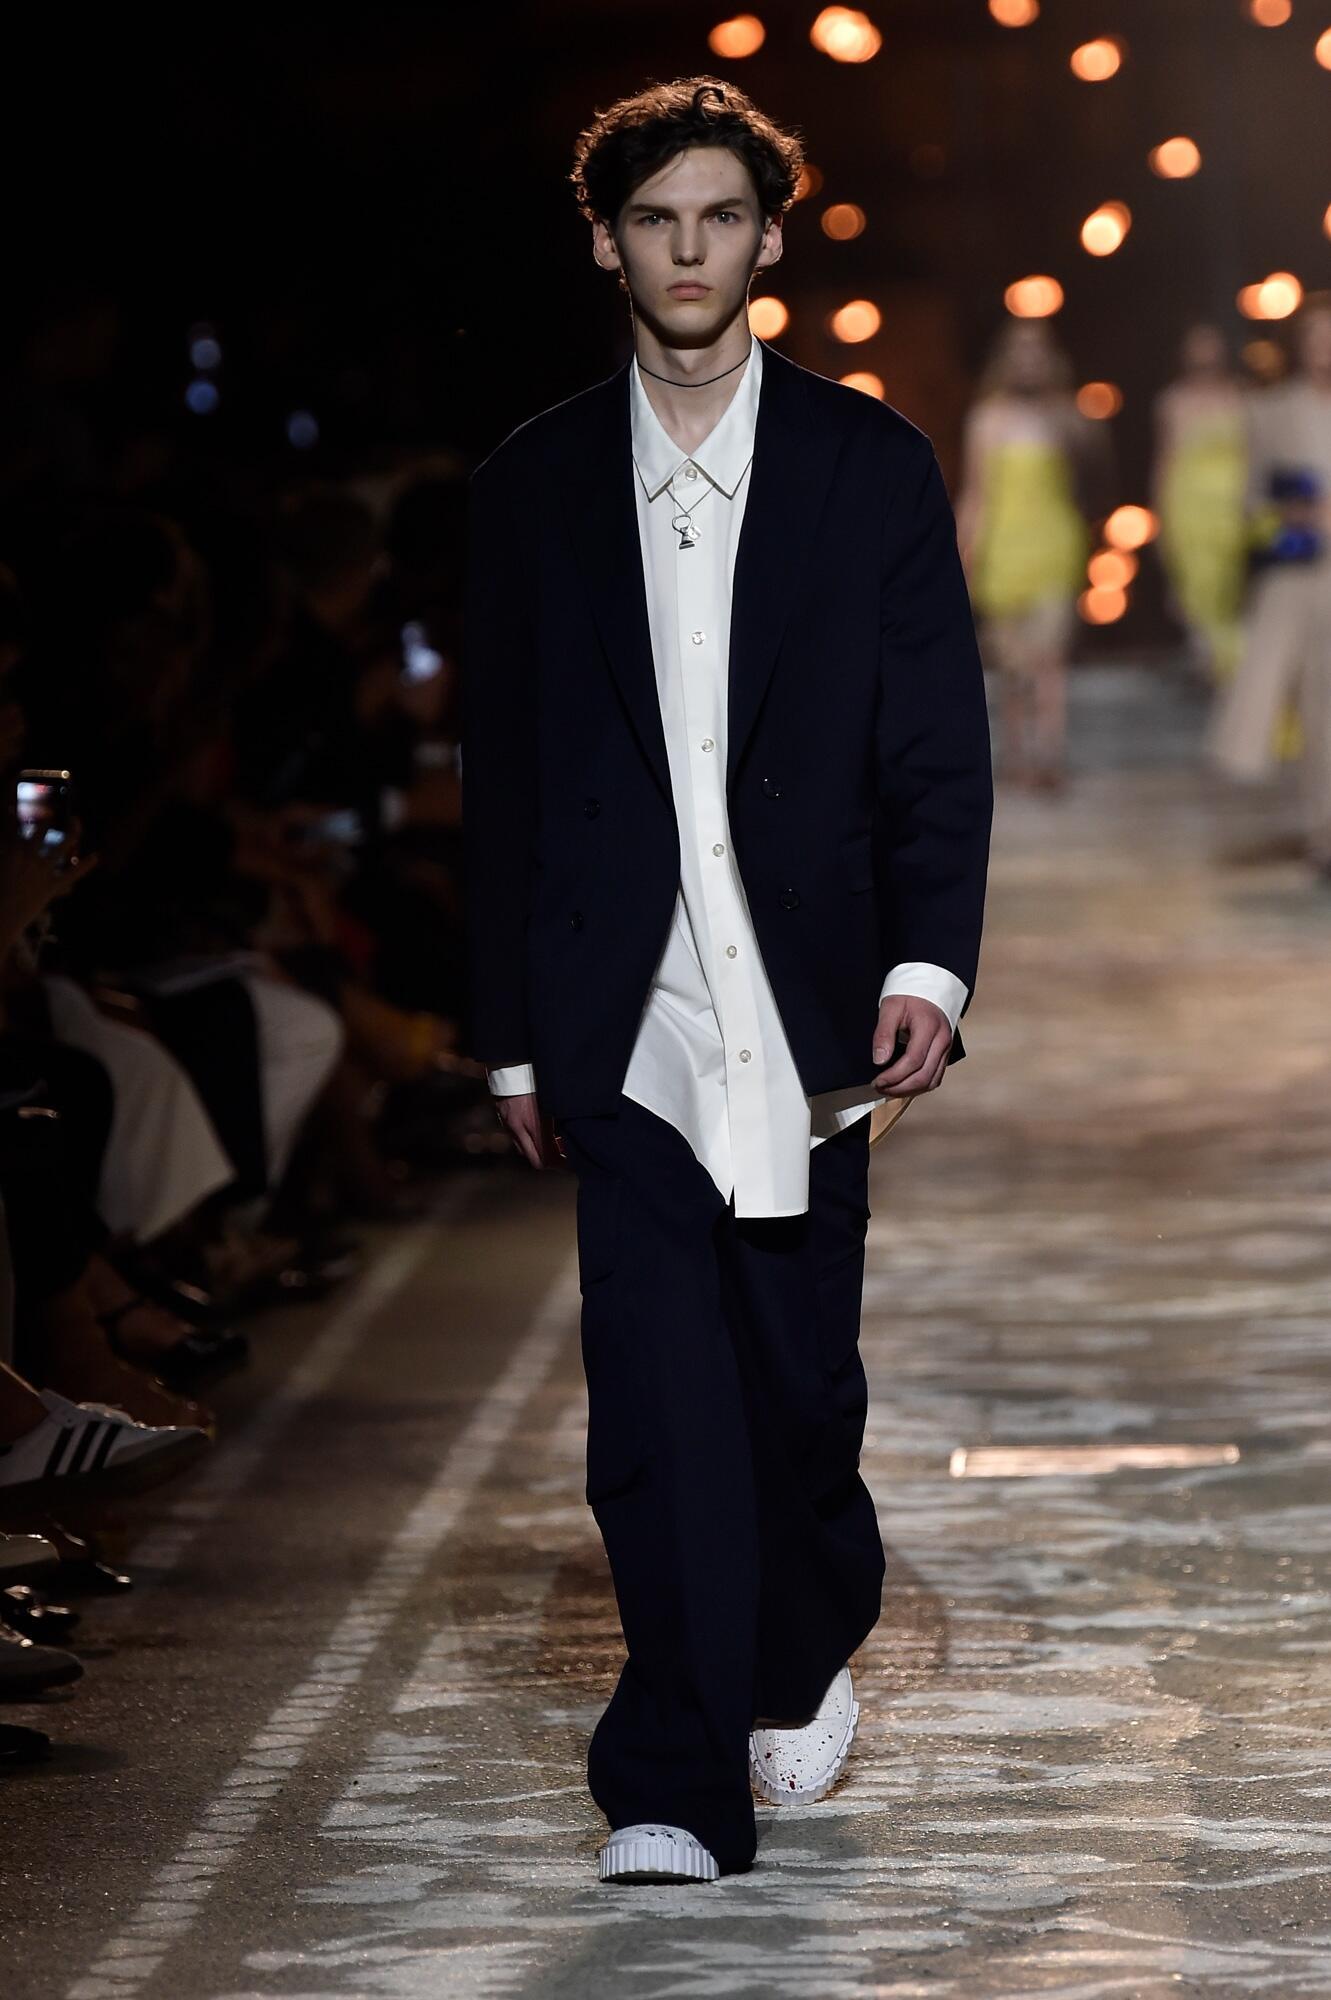 Hugo Man Fashion Style